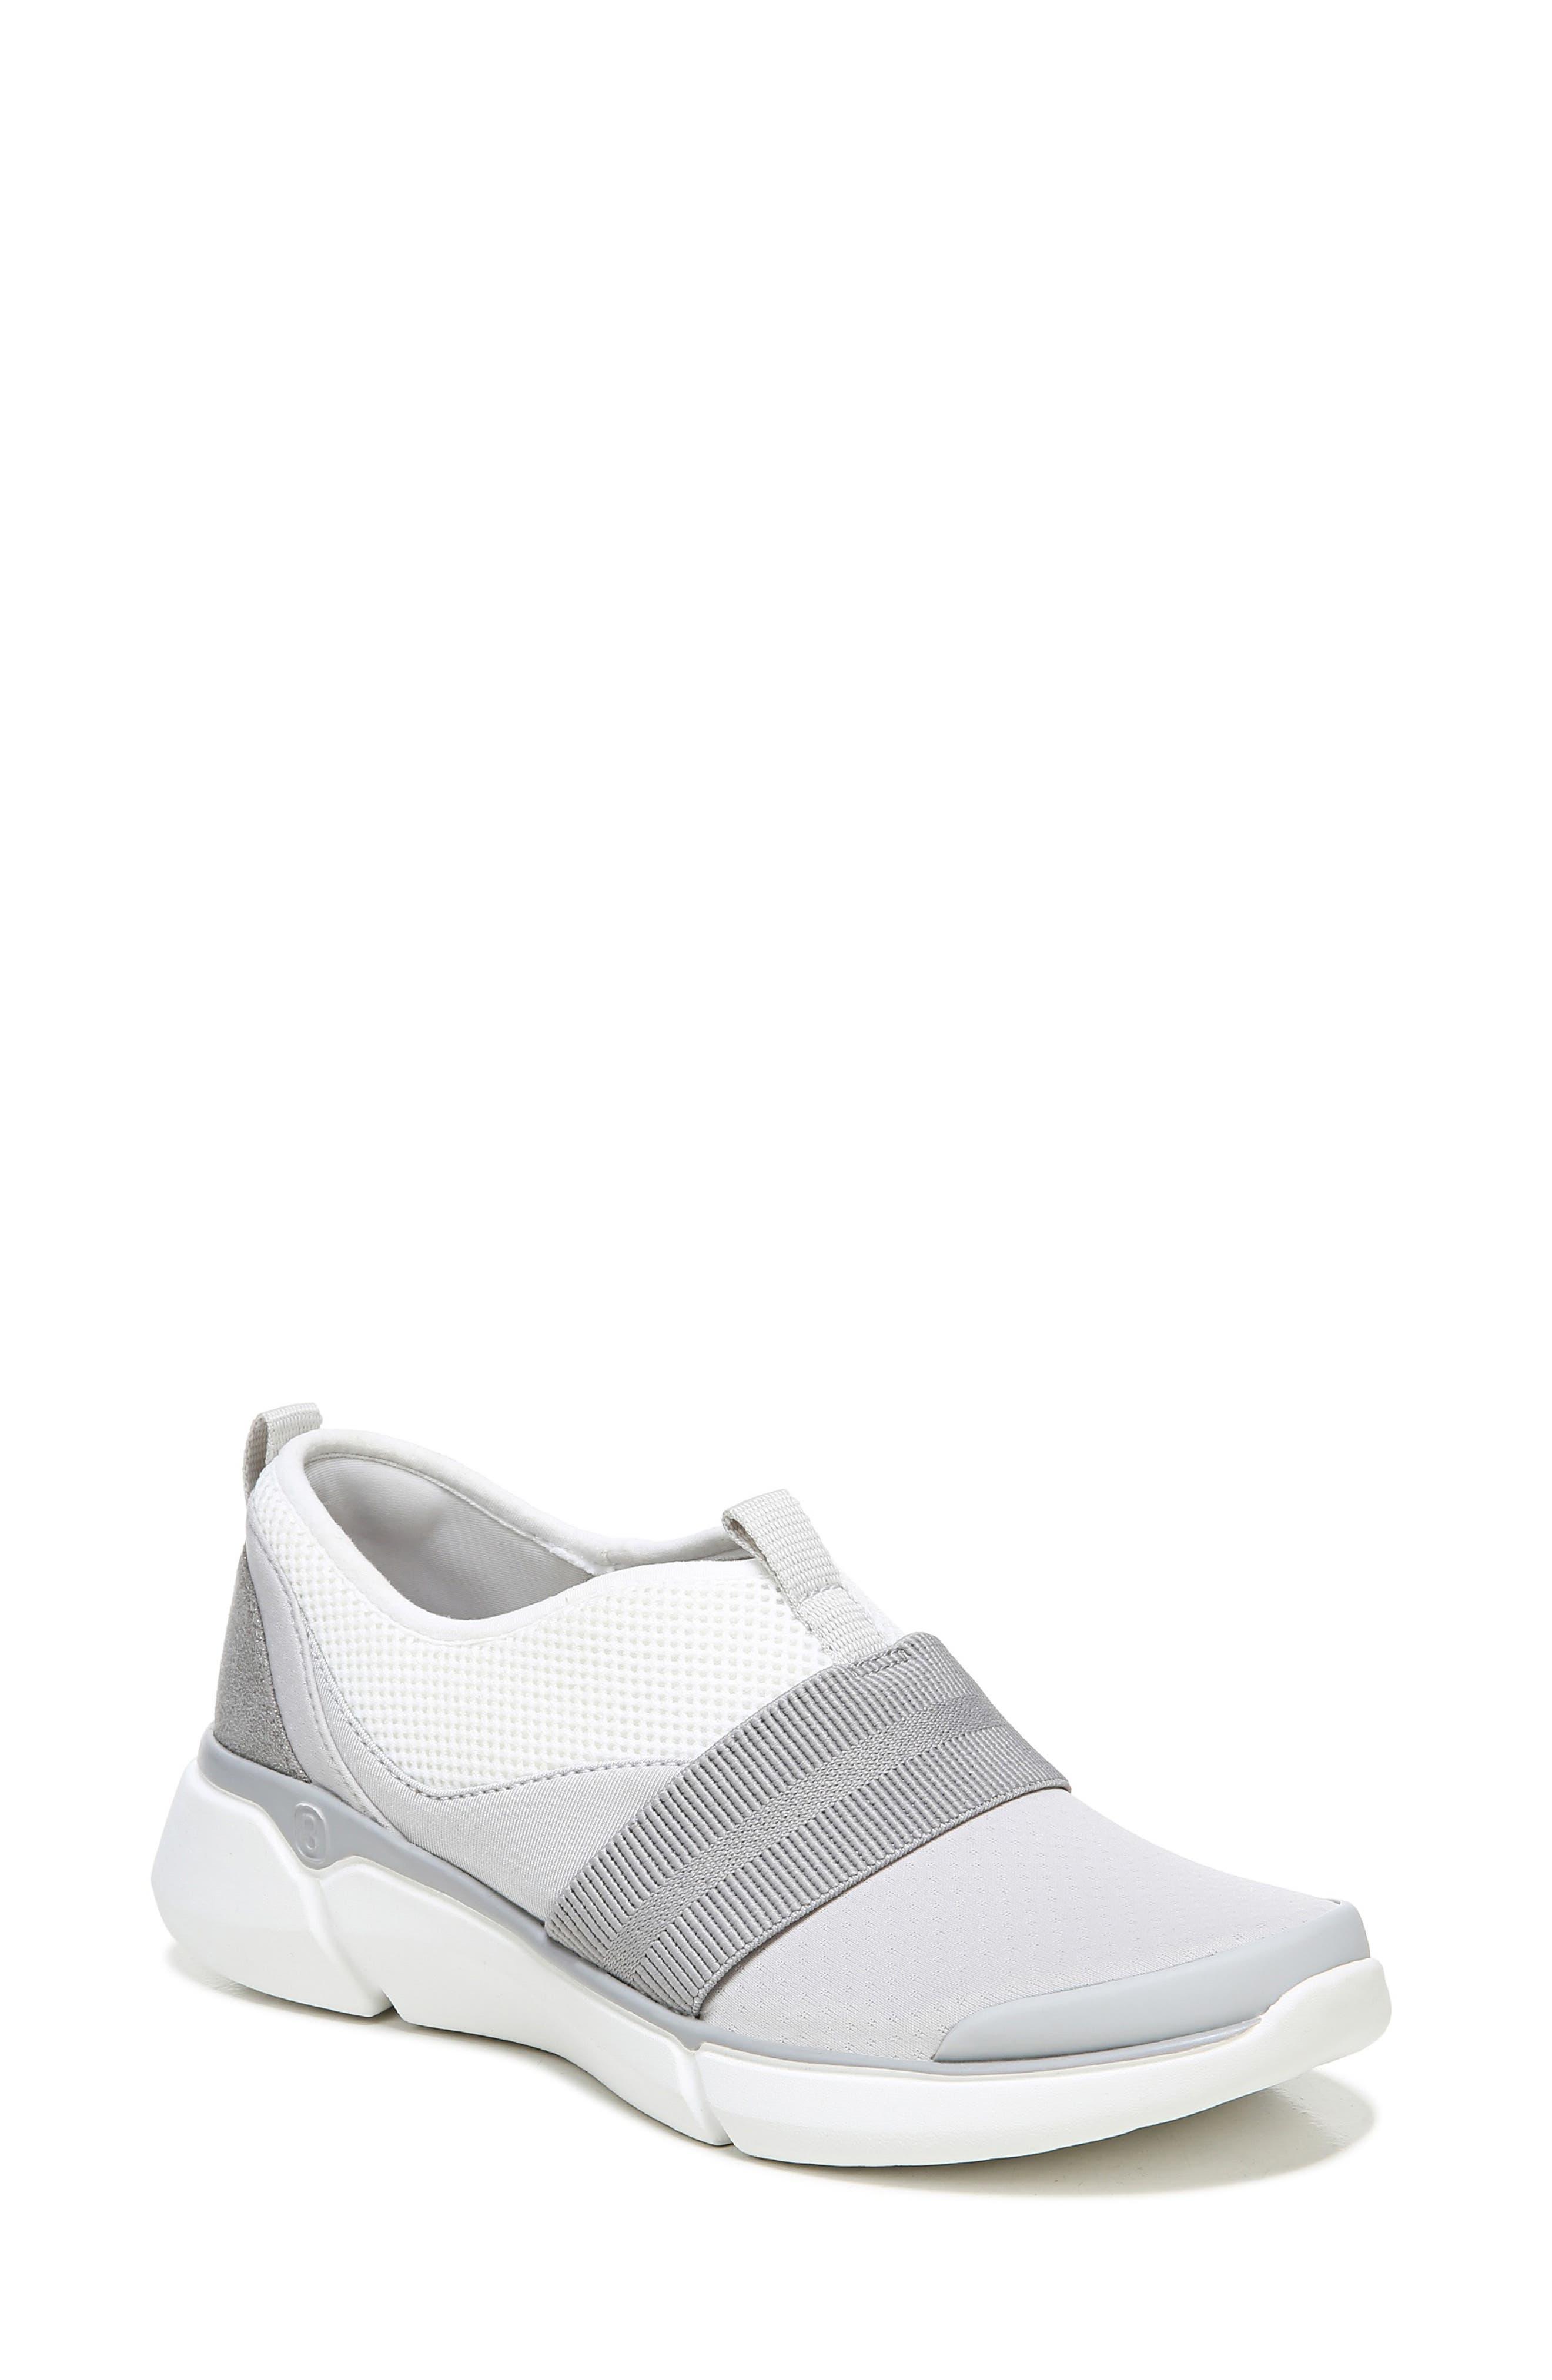 Haven Slip-On Sneaker